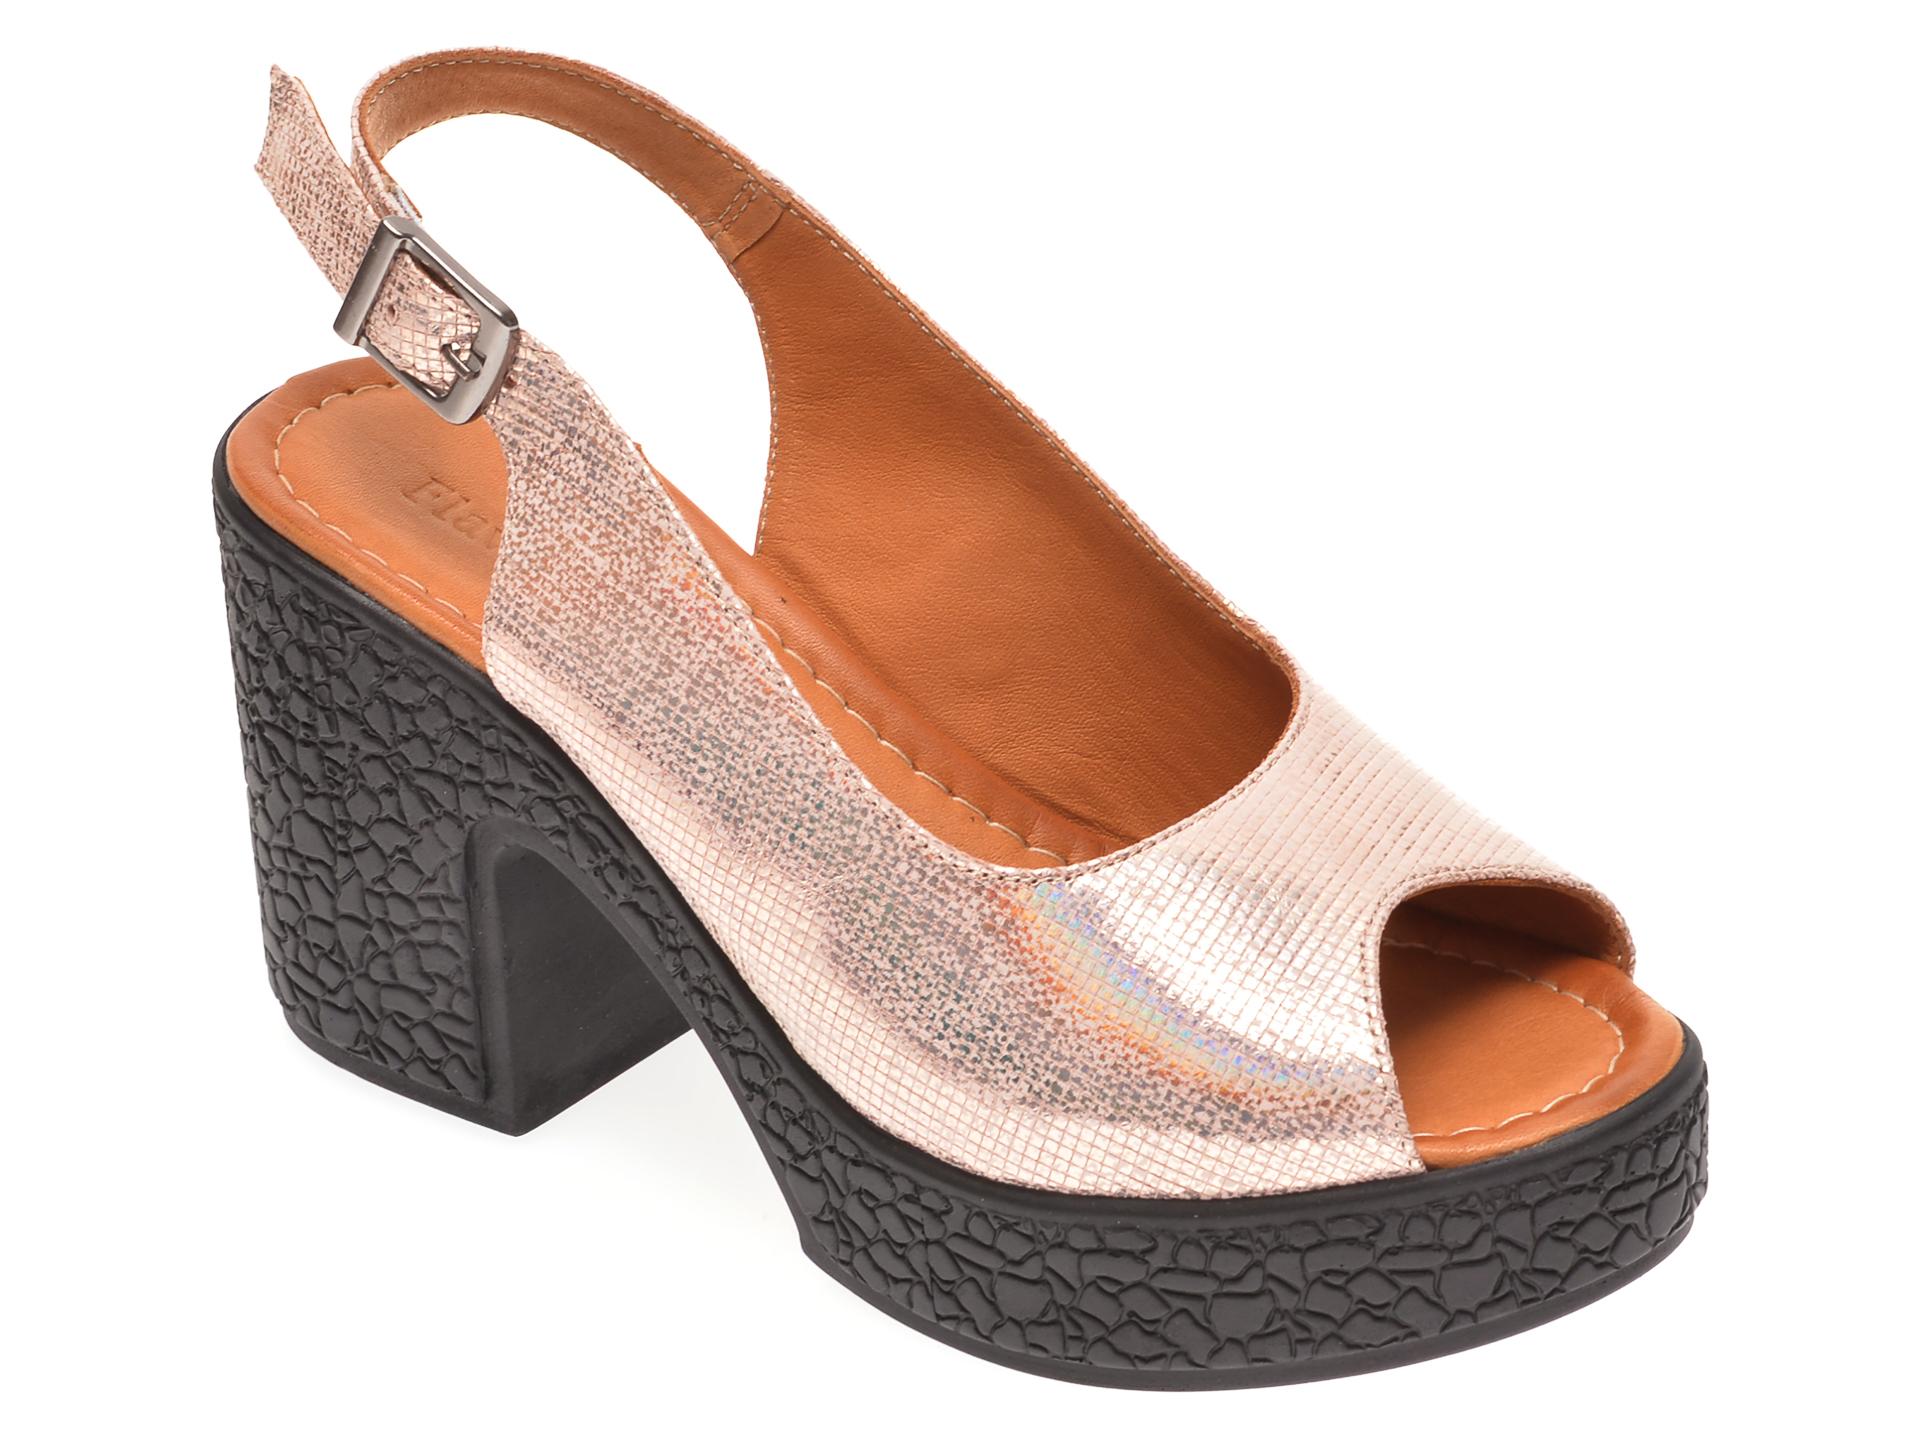 Sandale FLAVIA PASSINI bej, 1181735, din piele naturala imagine